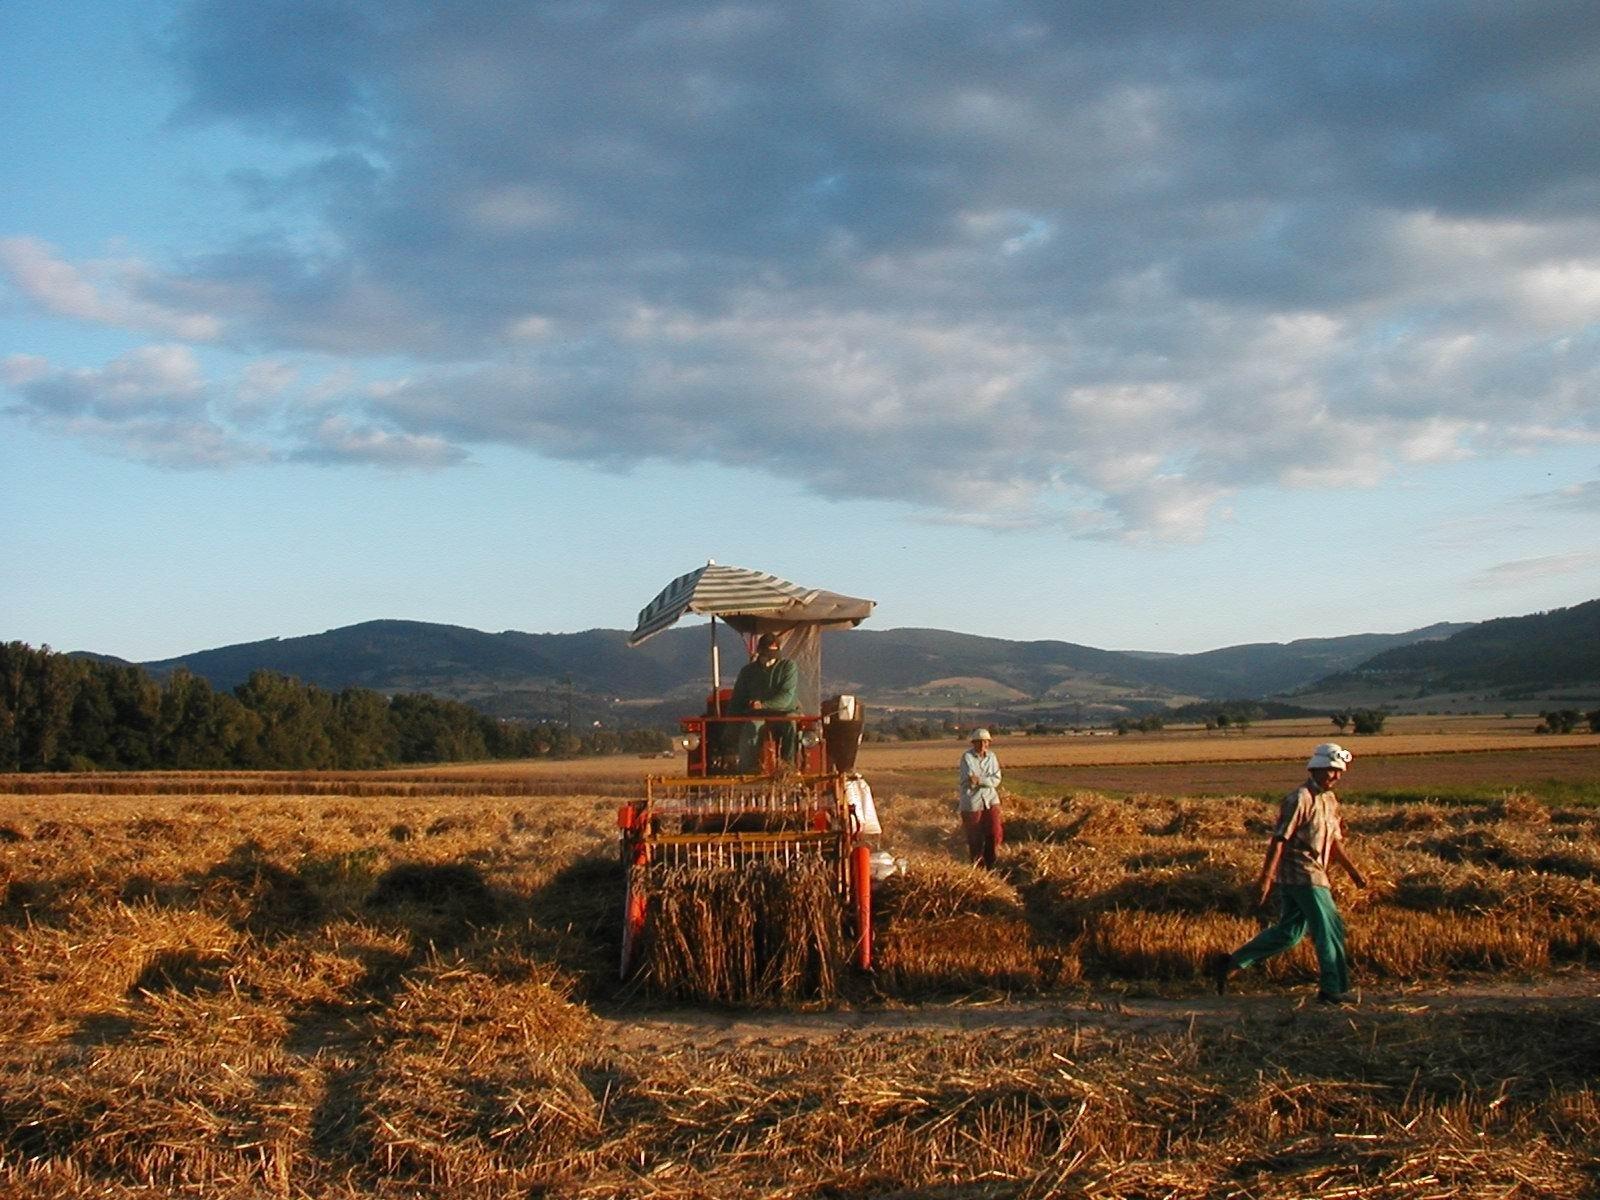 Zber pokusov ozimnej pšenice